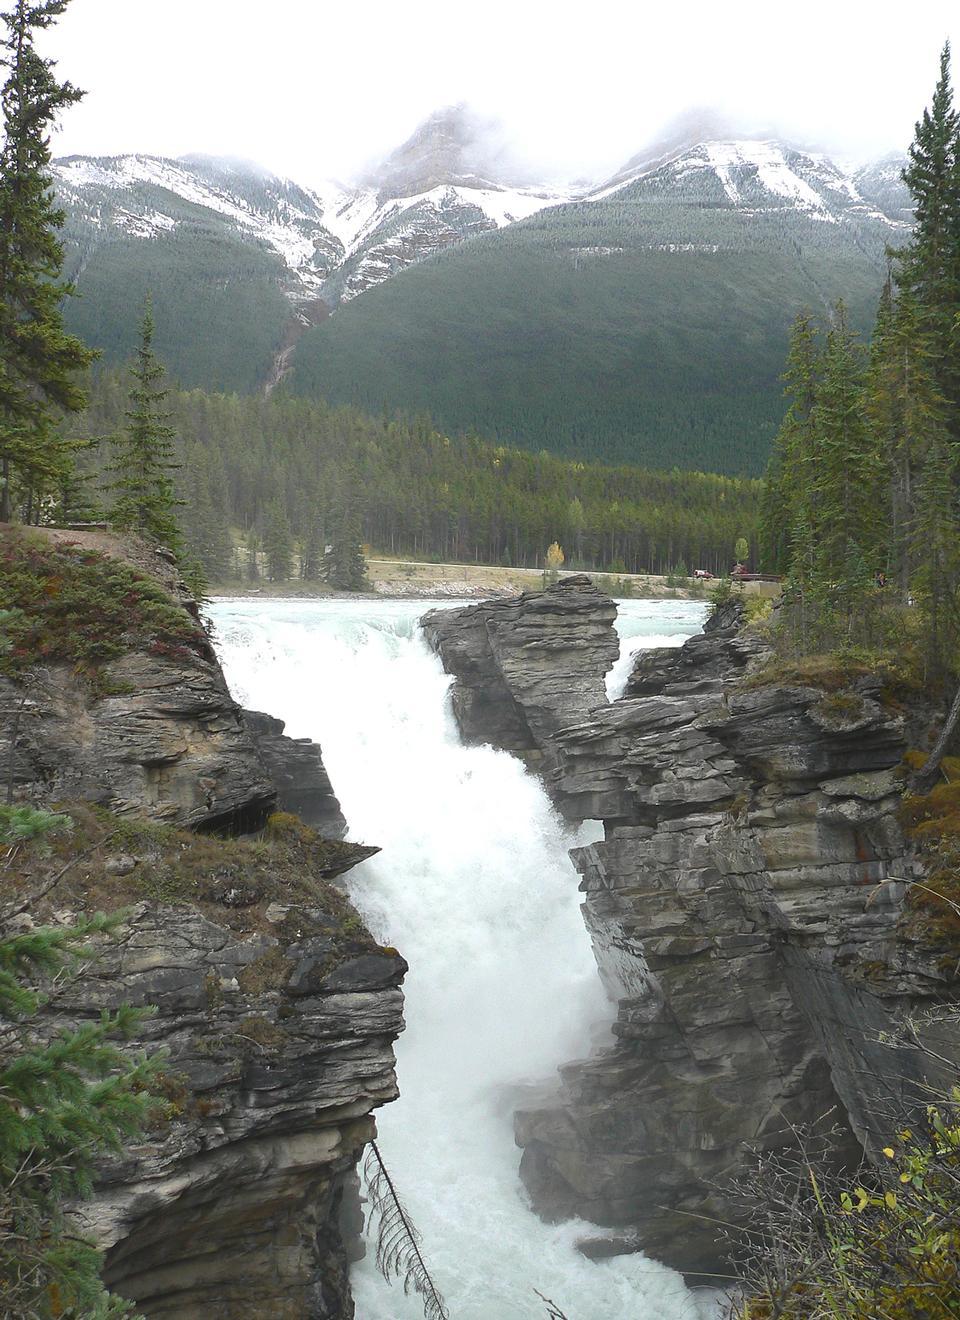 Free Athabasca Falls in Jasper National Park, Alberta, Canada